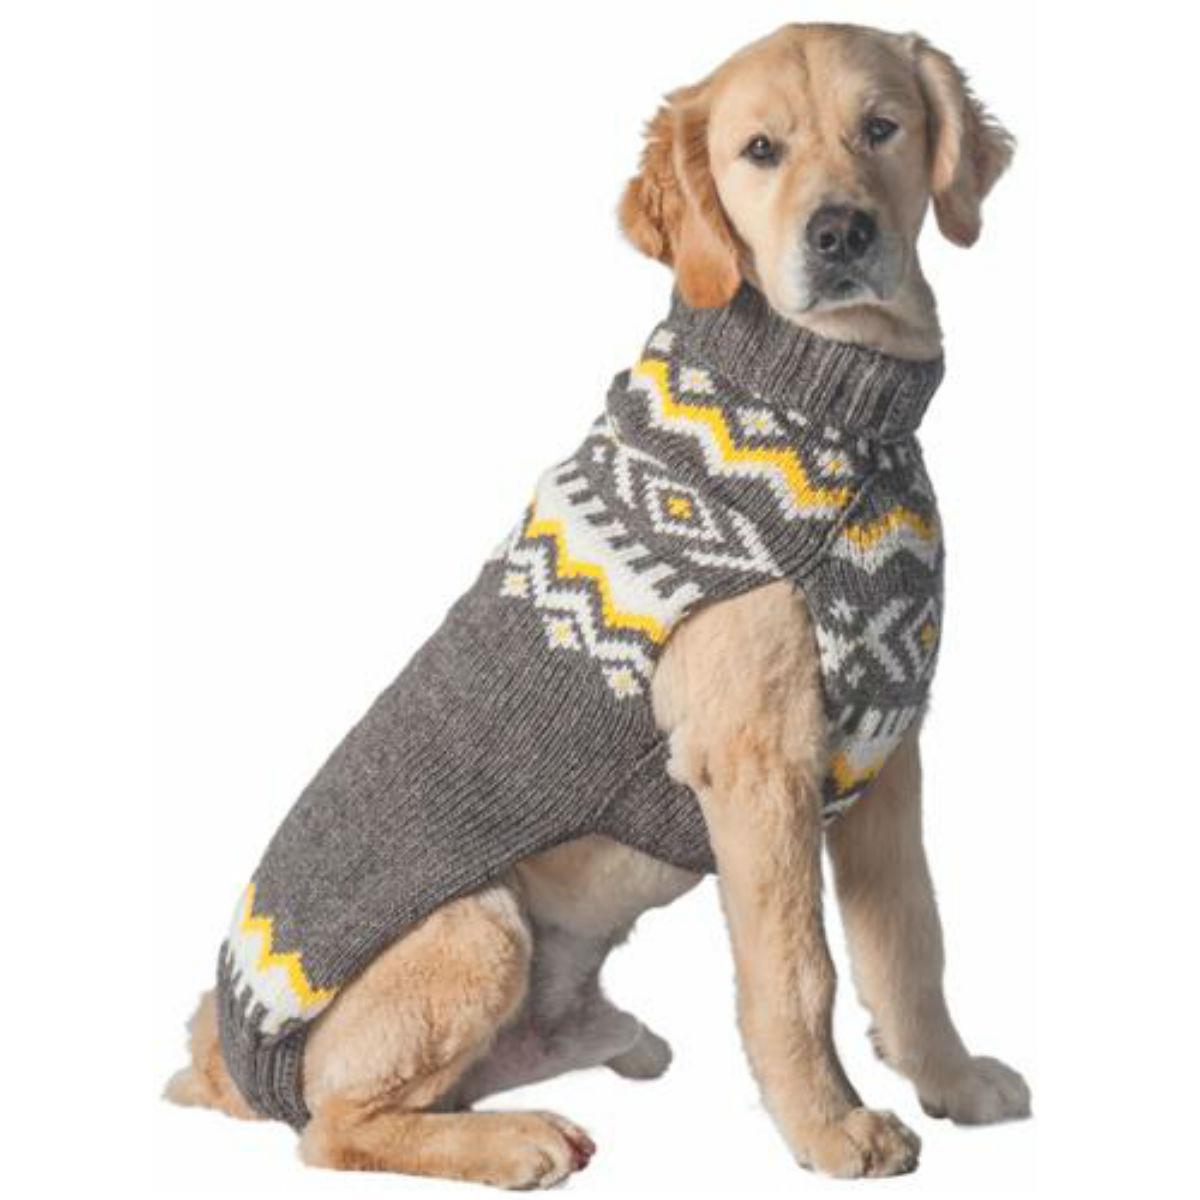 Handmade Nordic Wool Dog Sweater - Gray